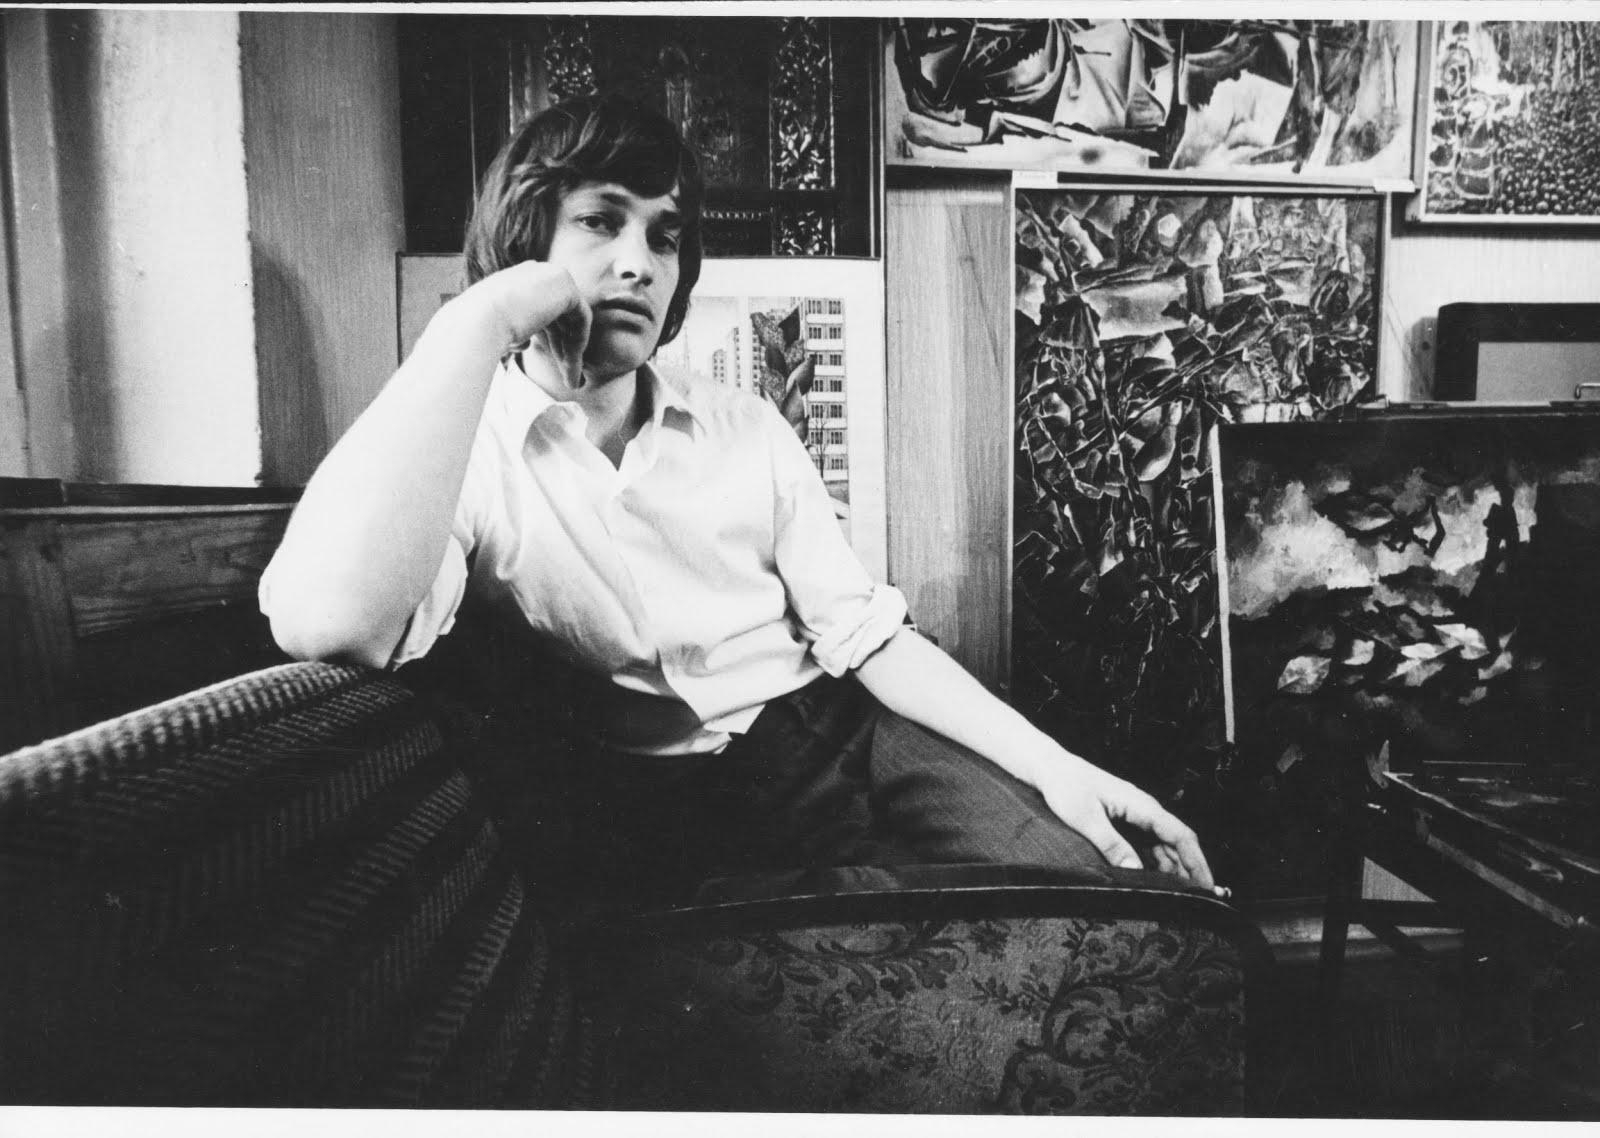 ALEXANDER RABINE, 1976